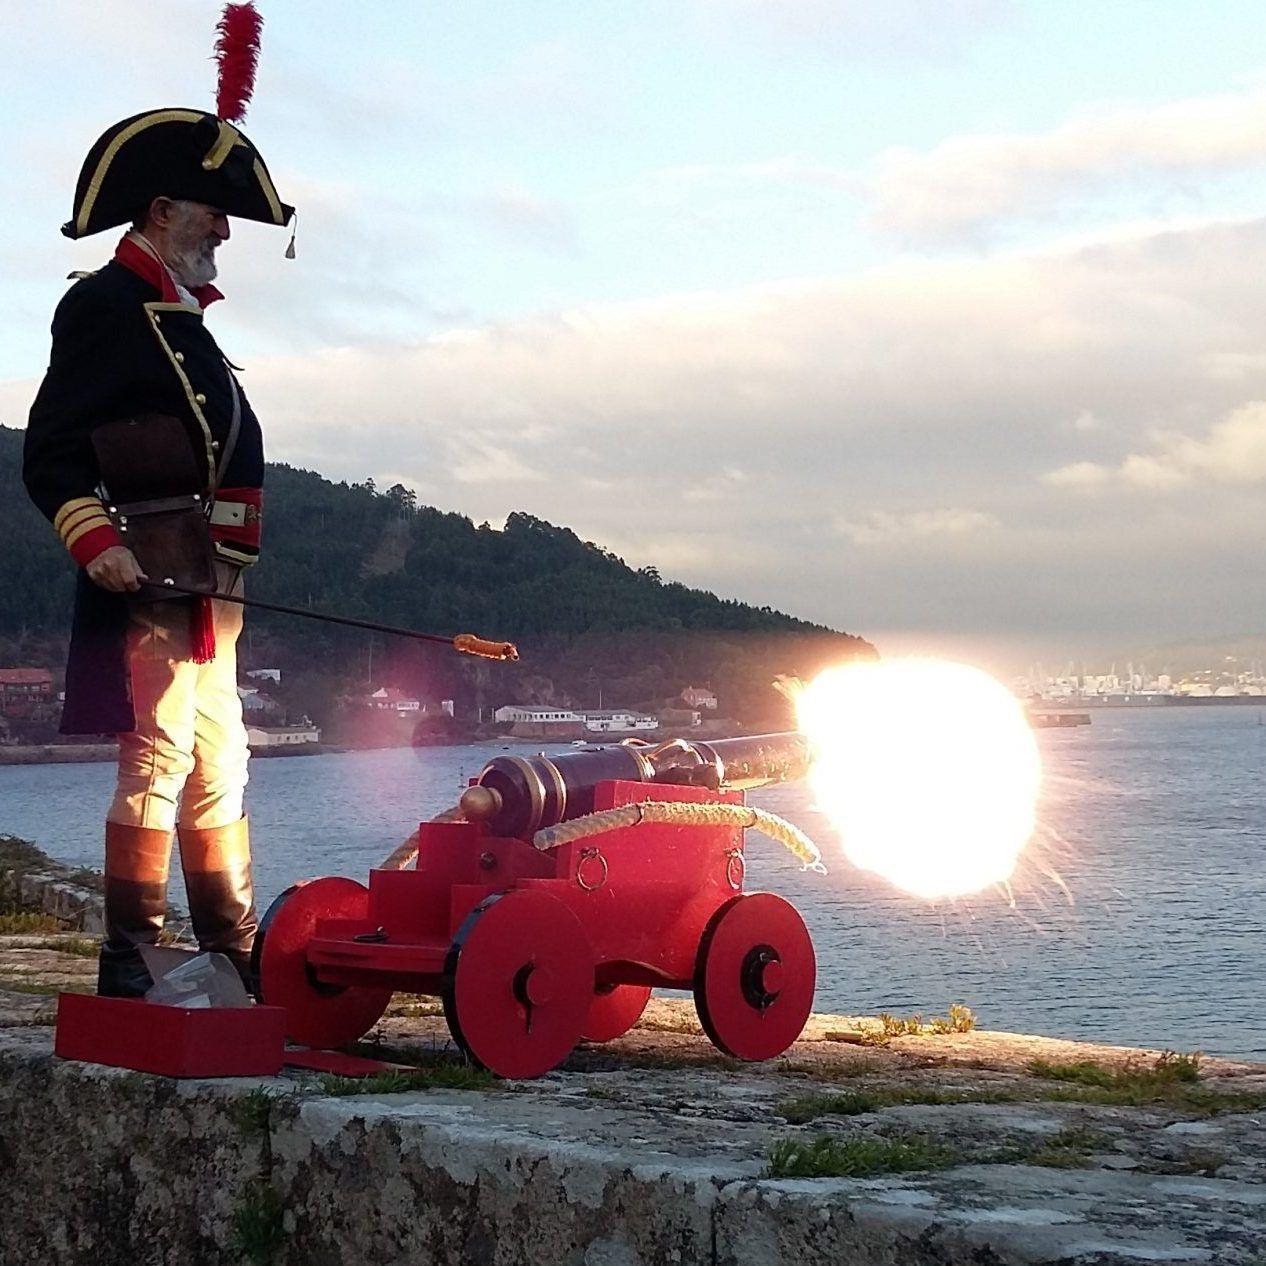 castillo de San Felipe Ferrol, visitas teatralizadas, cañon